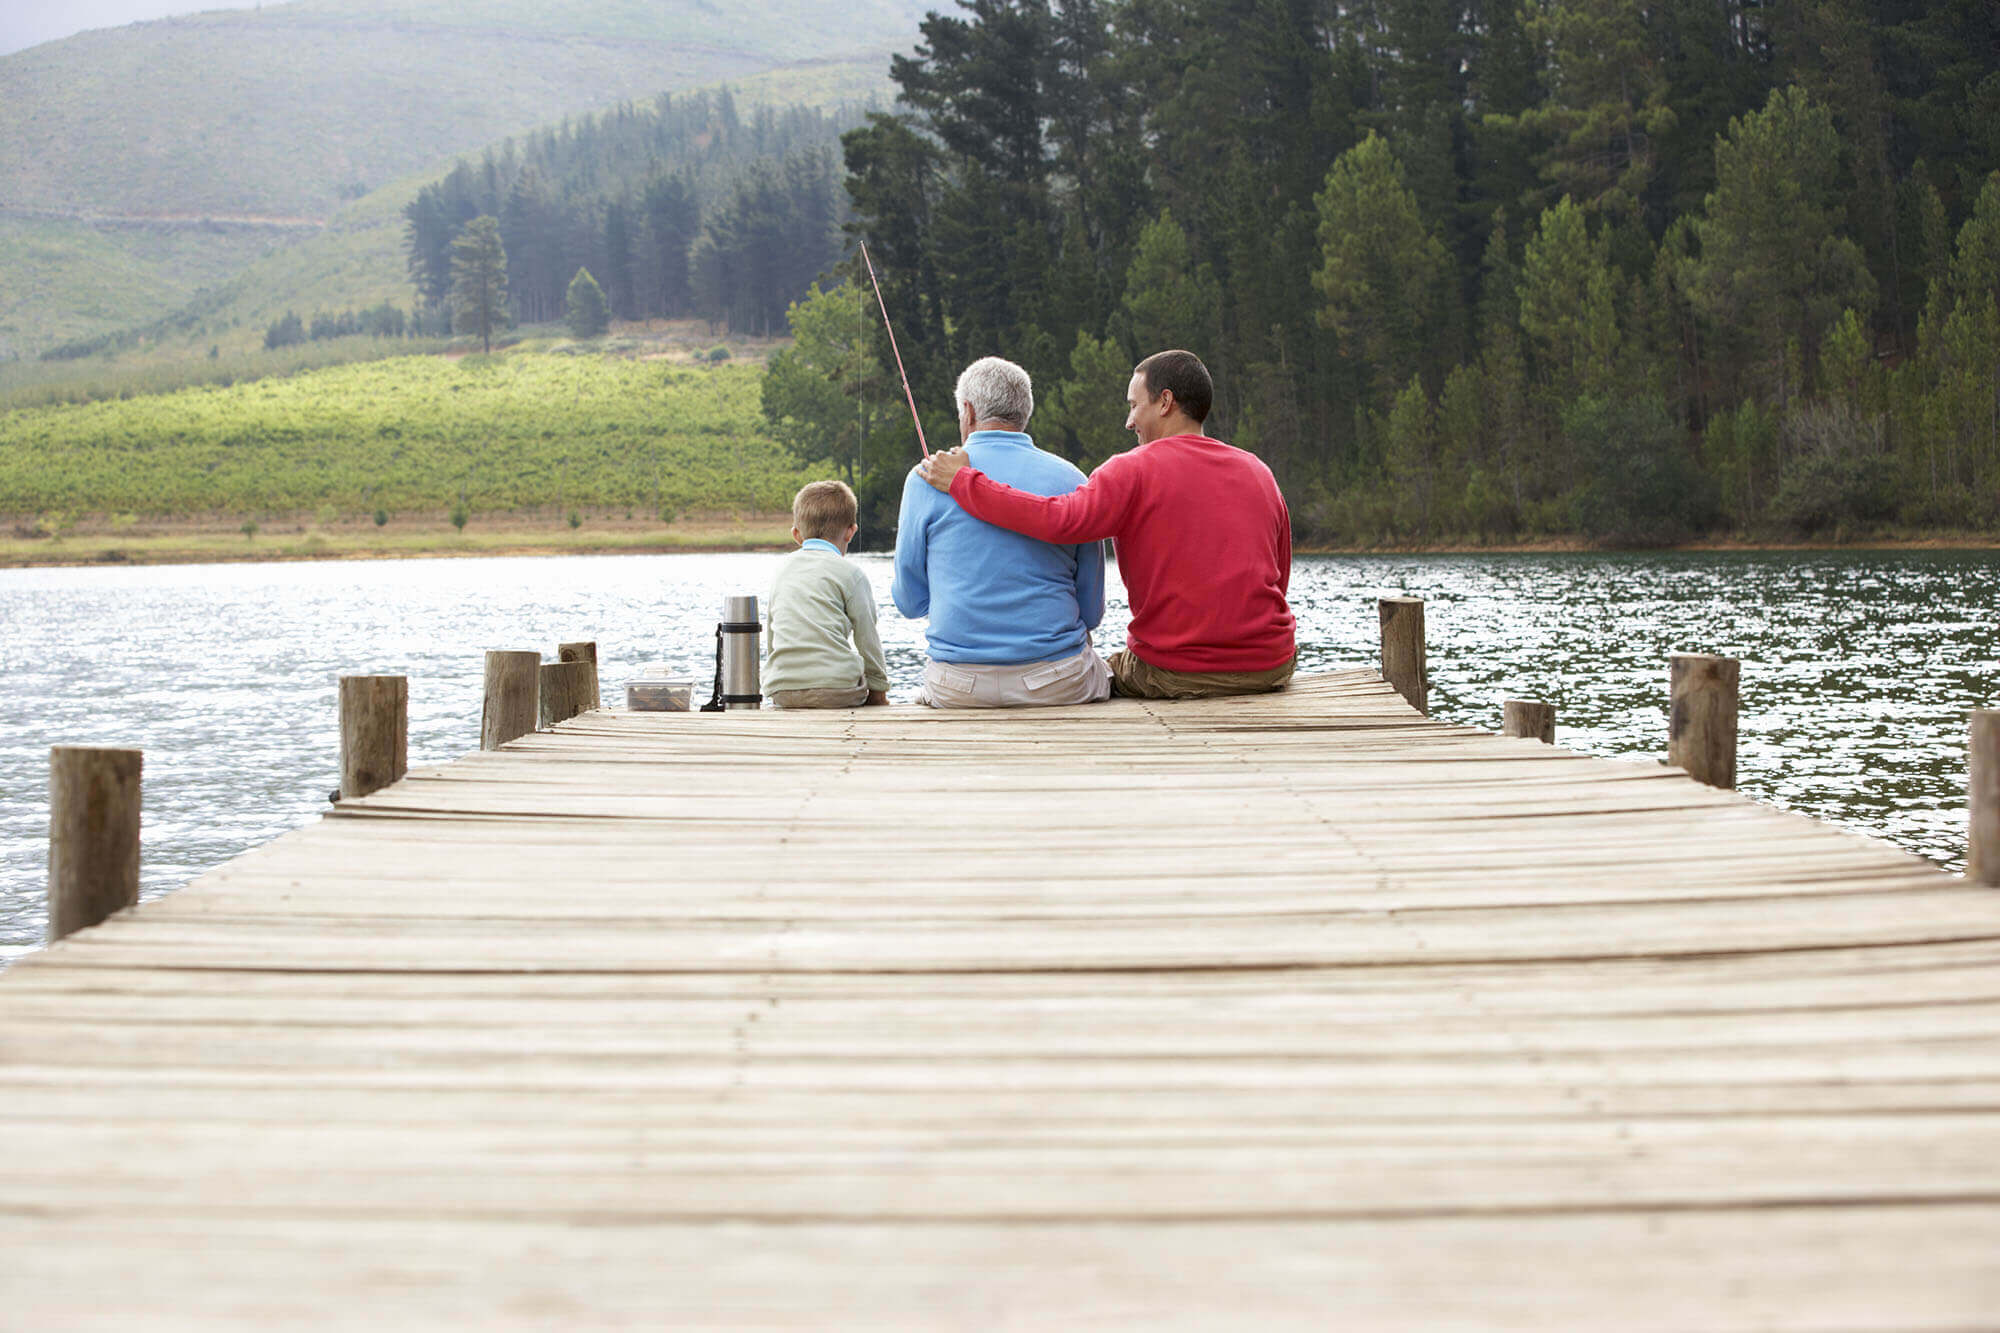 Balderhead Reservoir Waterside Parks